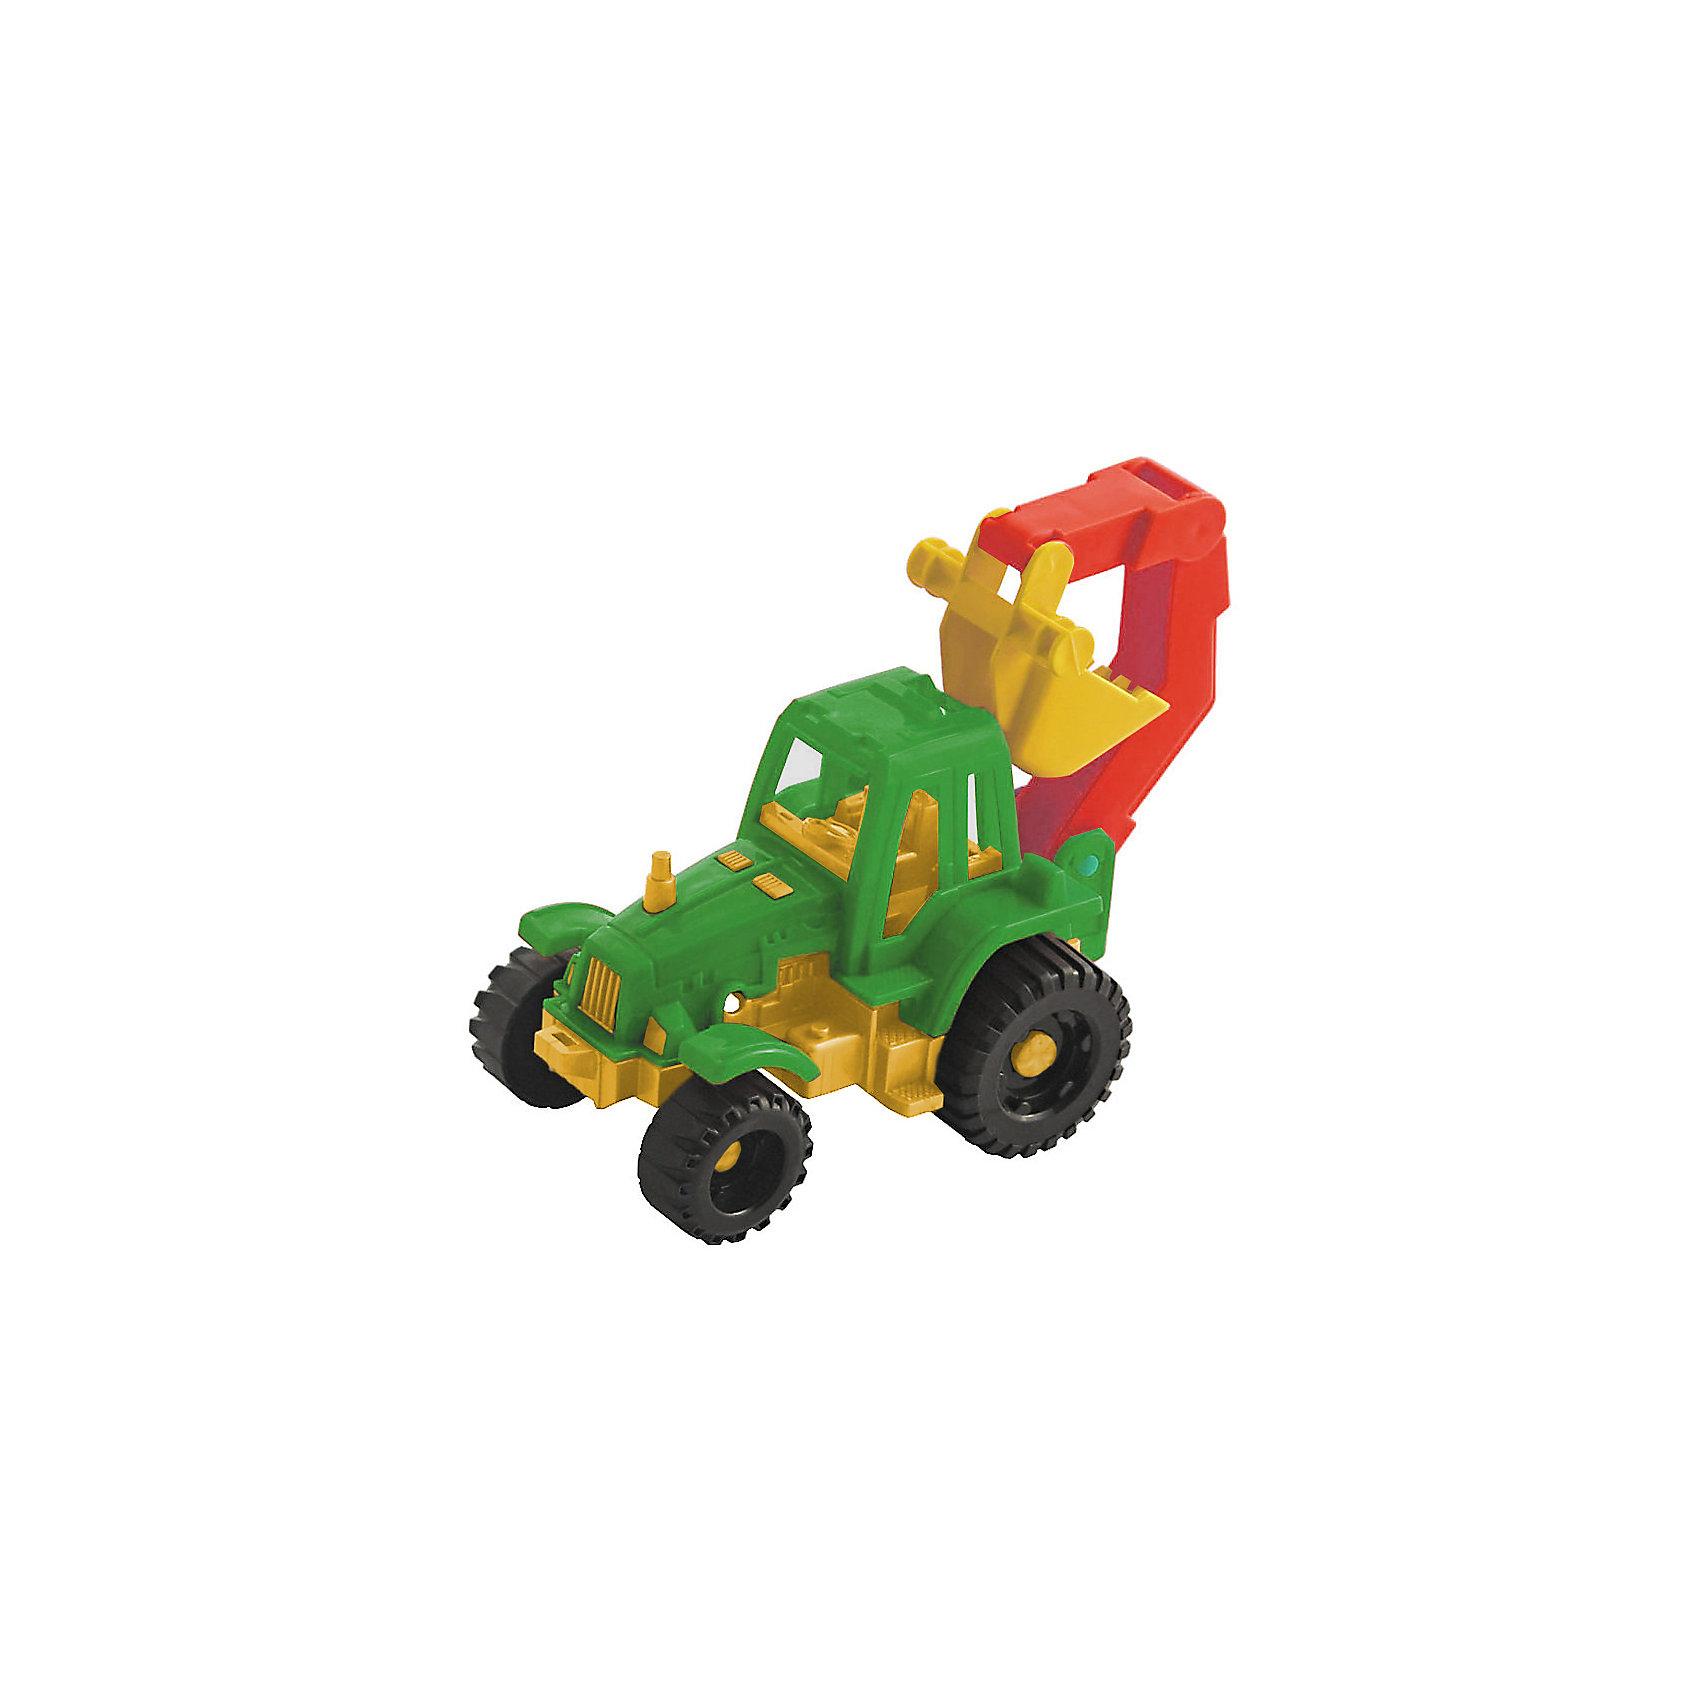 Нордпласт Трактор Ижора с ковшом, Нордпласт, в ассортименте машинки нордпласт трактор ижора с ковшом